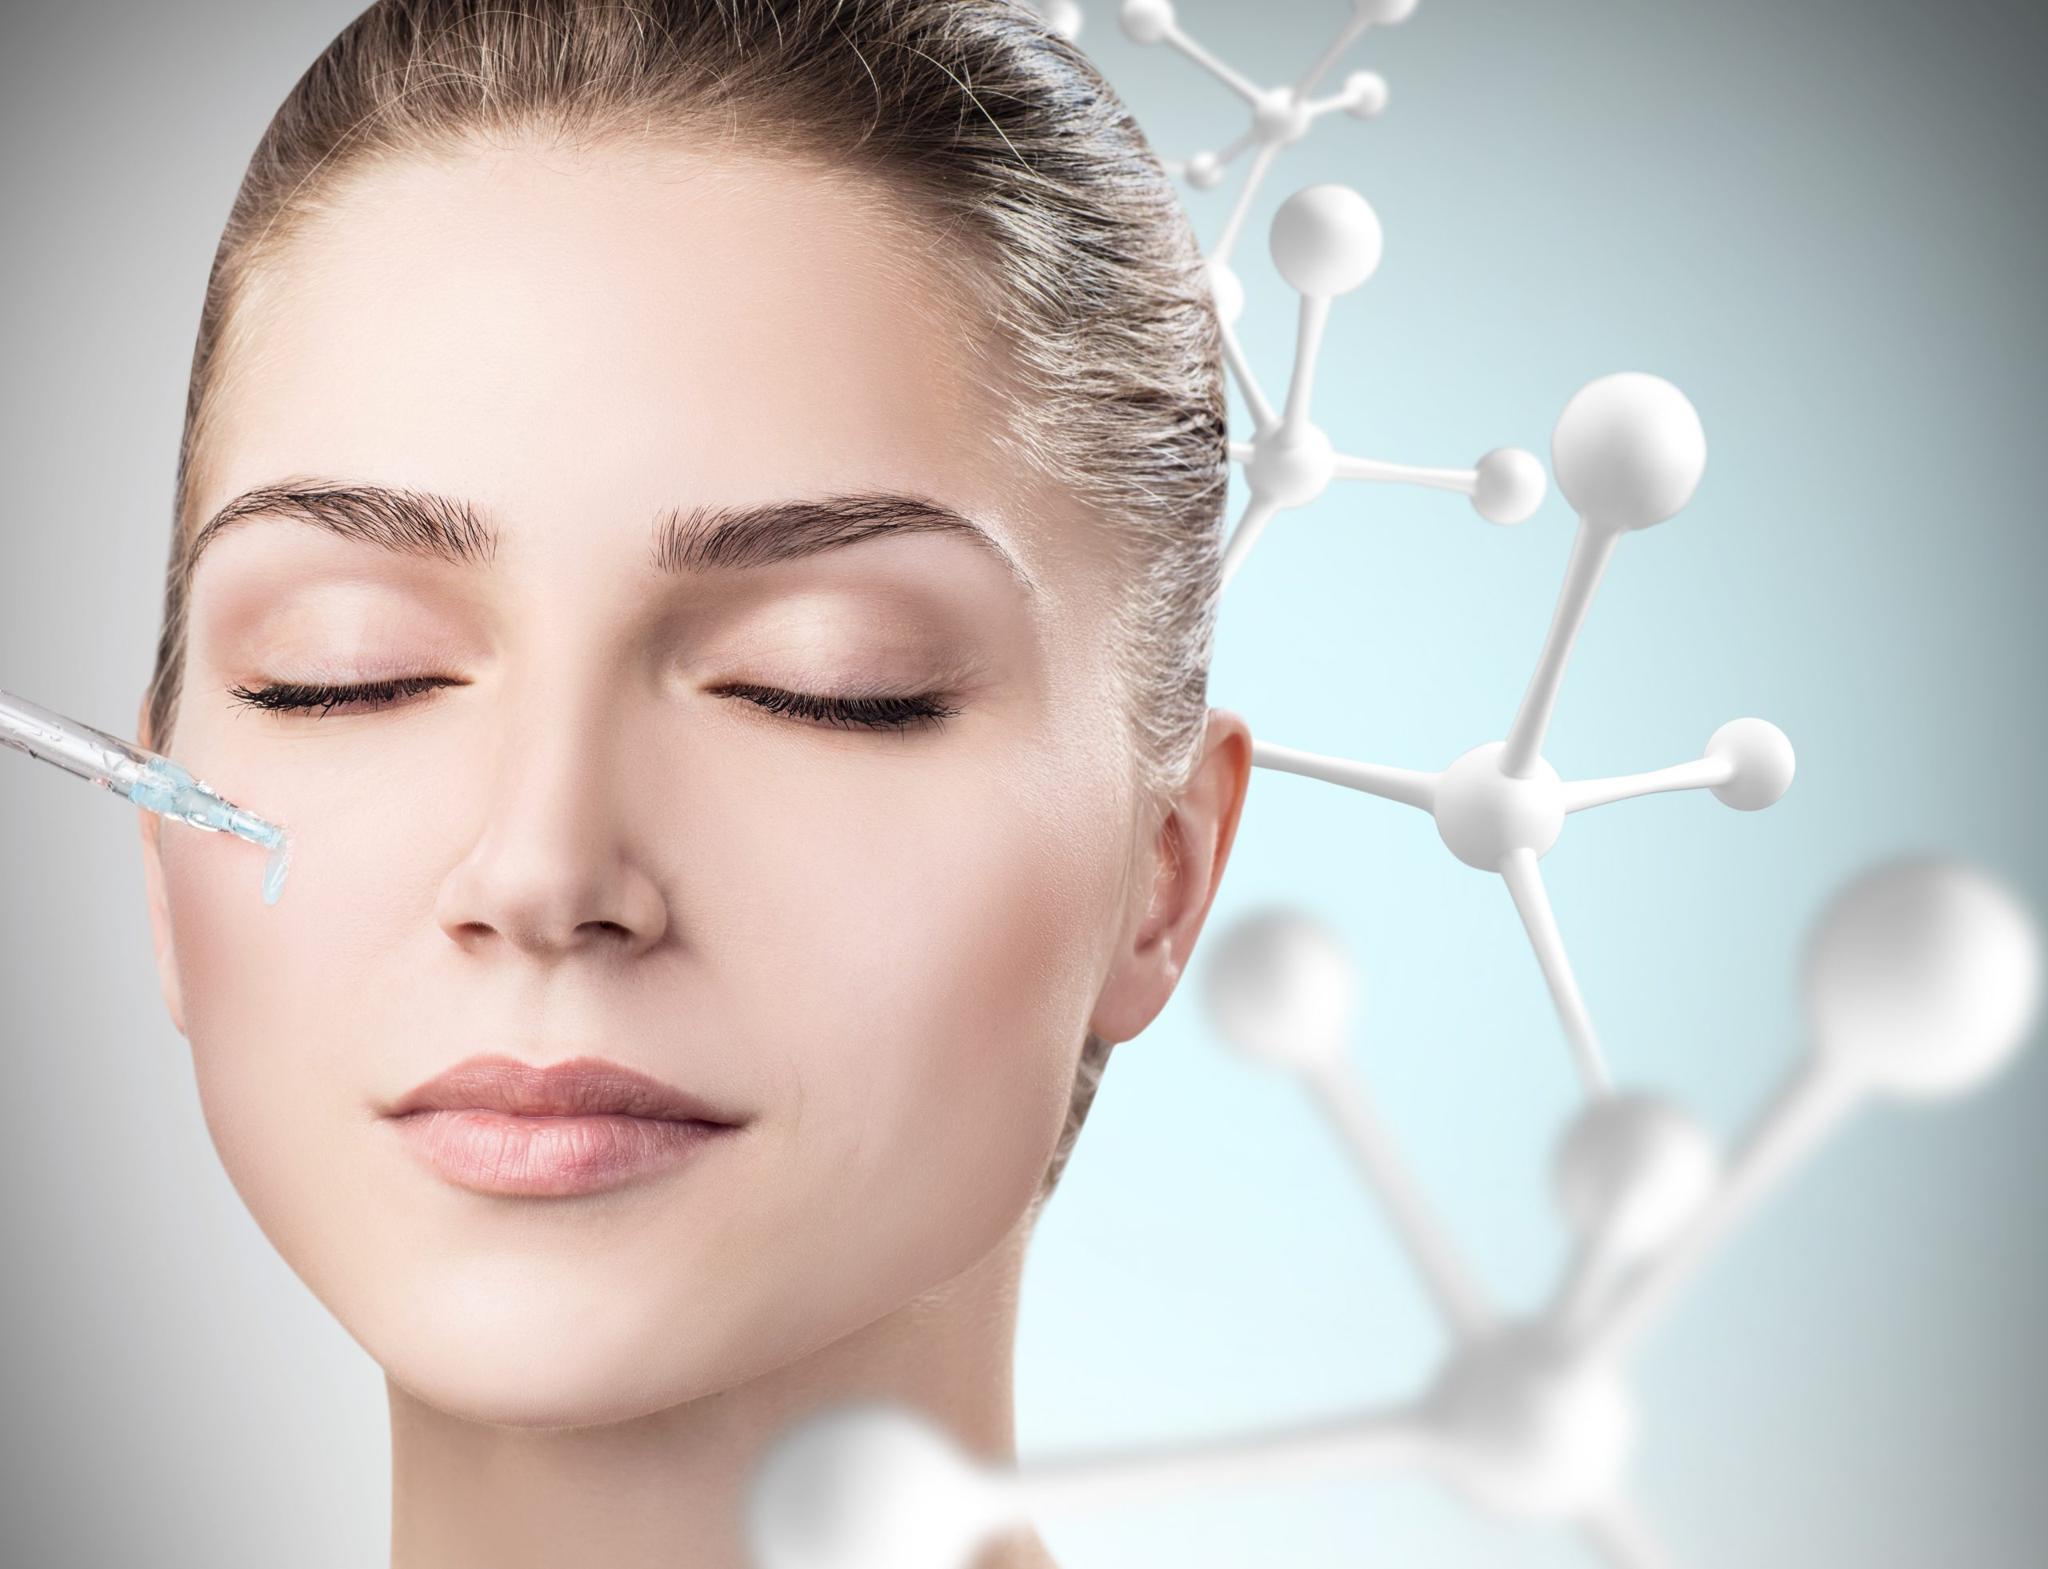 beautical hyaluronic acid serum cream moisturizing